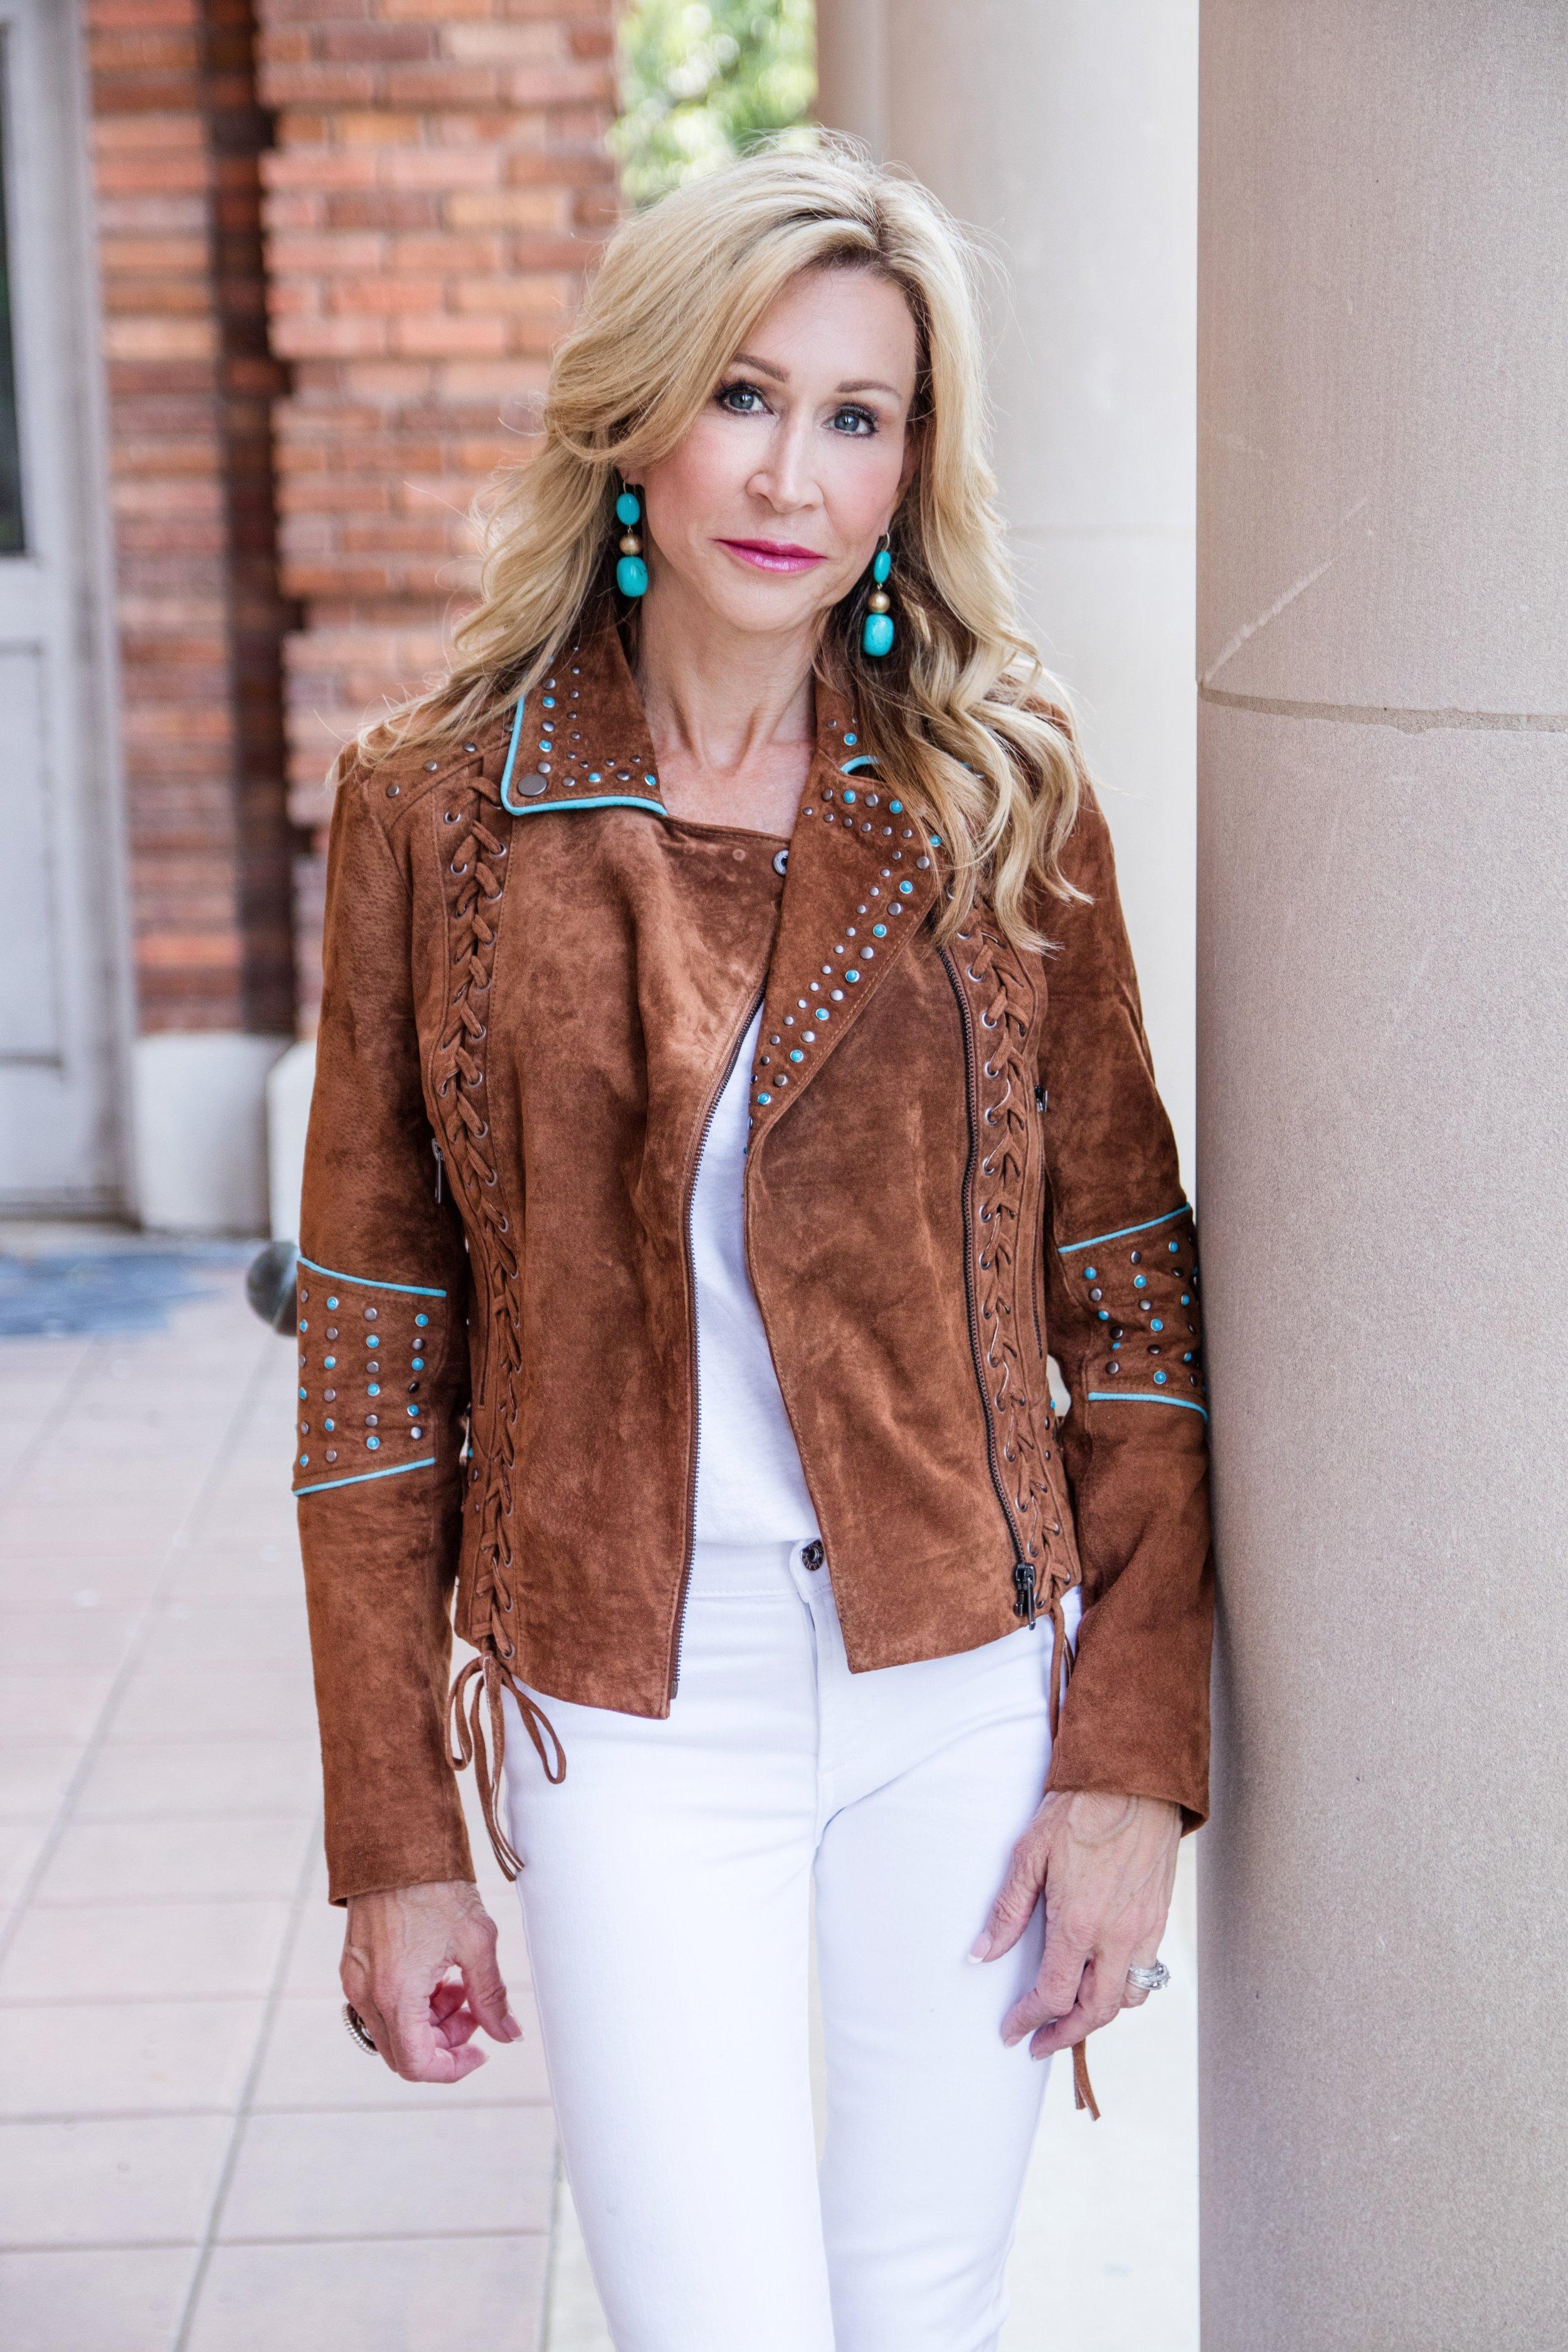 Casual Spring Outfit - Boston Proper suede jacket white jacket, Slane earrings